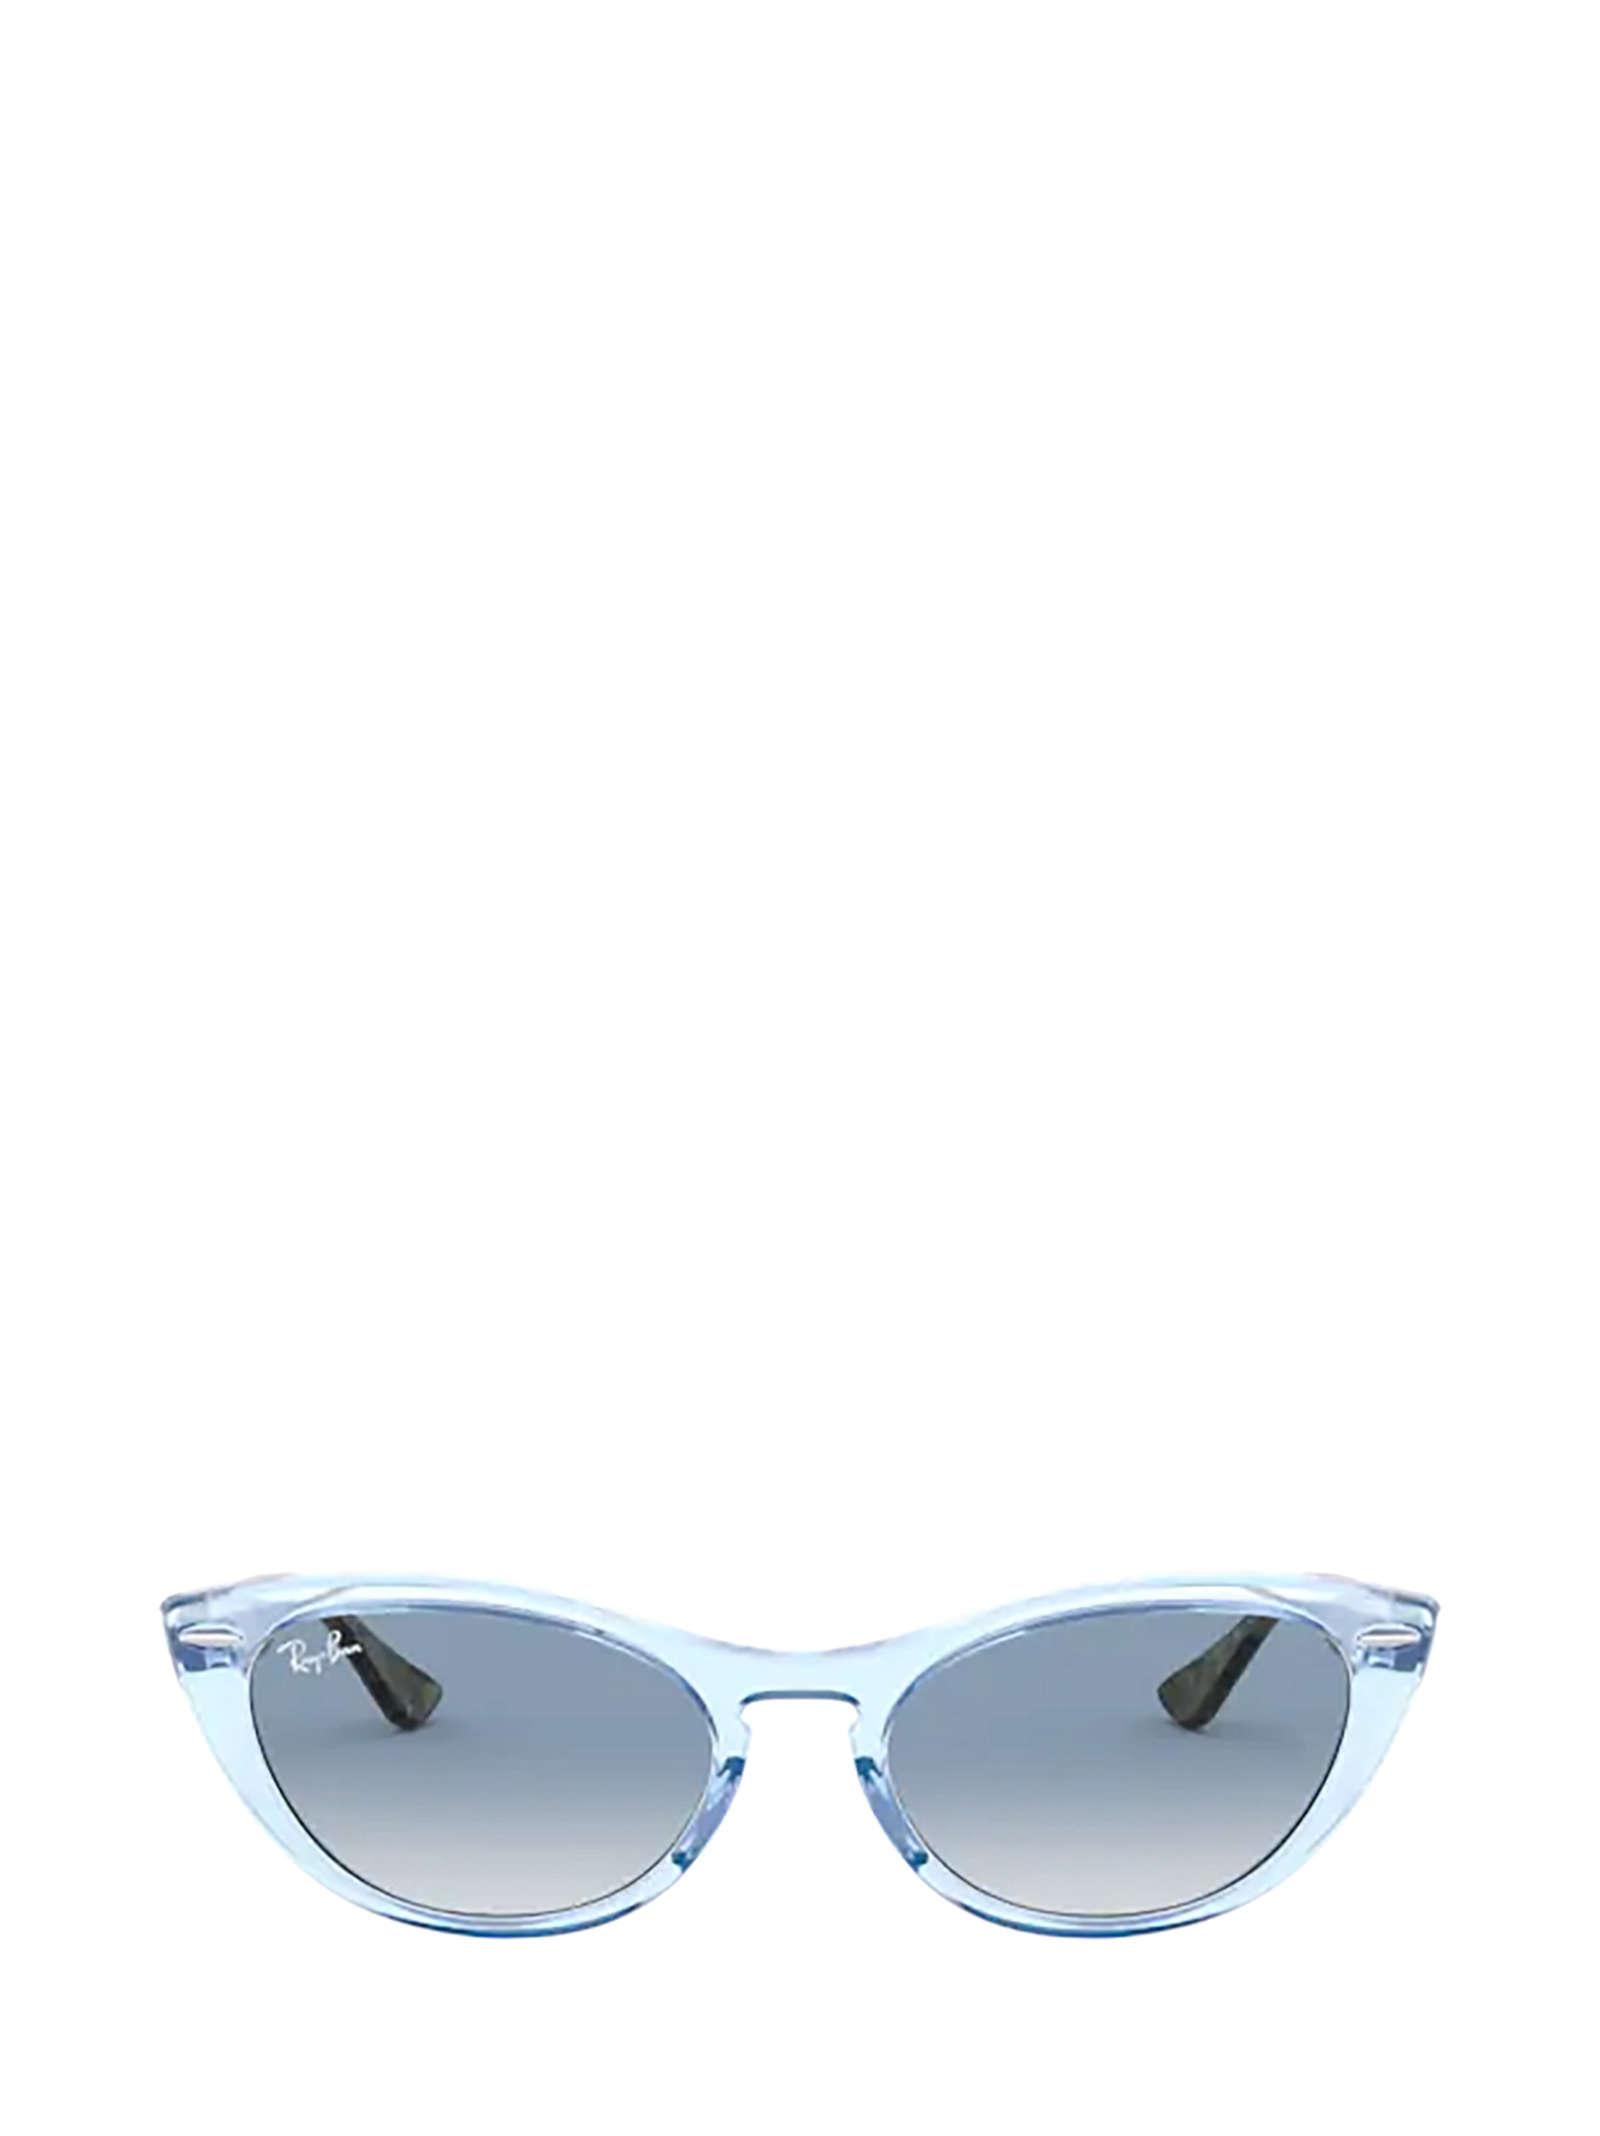 Ray-Ban Ray-ban Rb4314n Transparent Light Blue Sunglasses